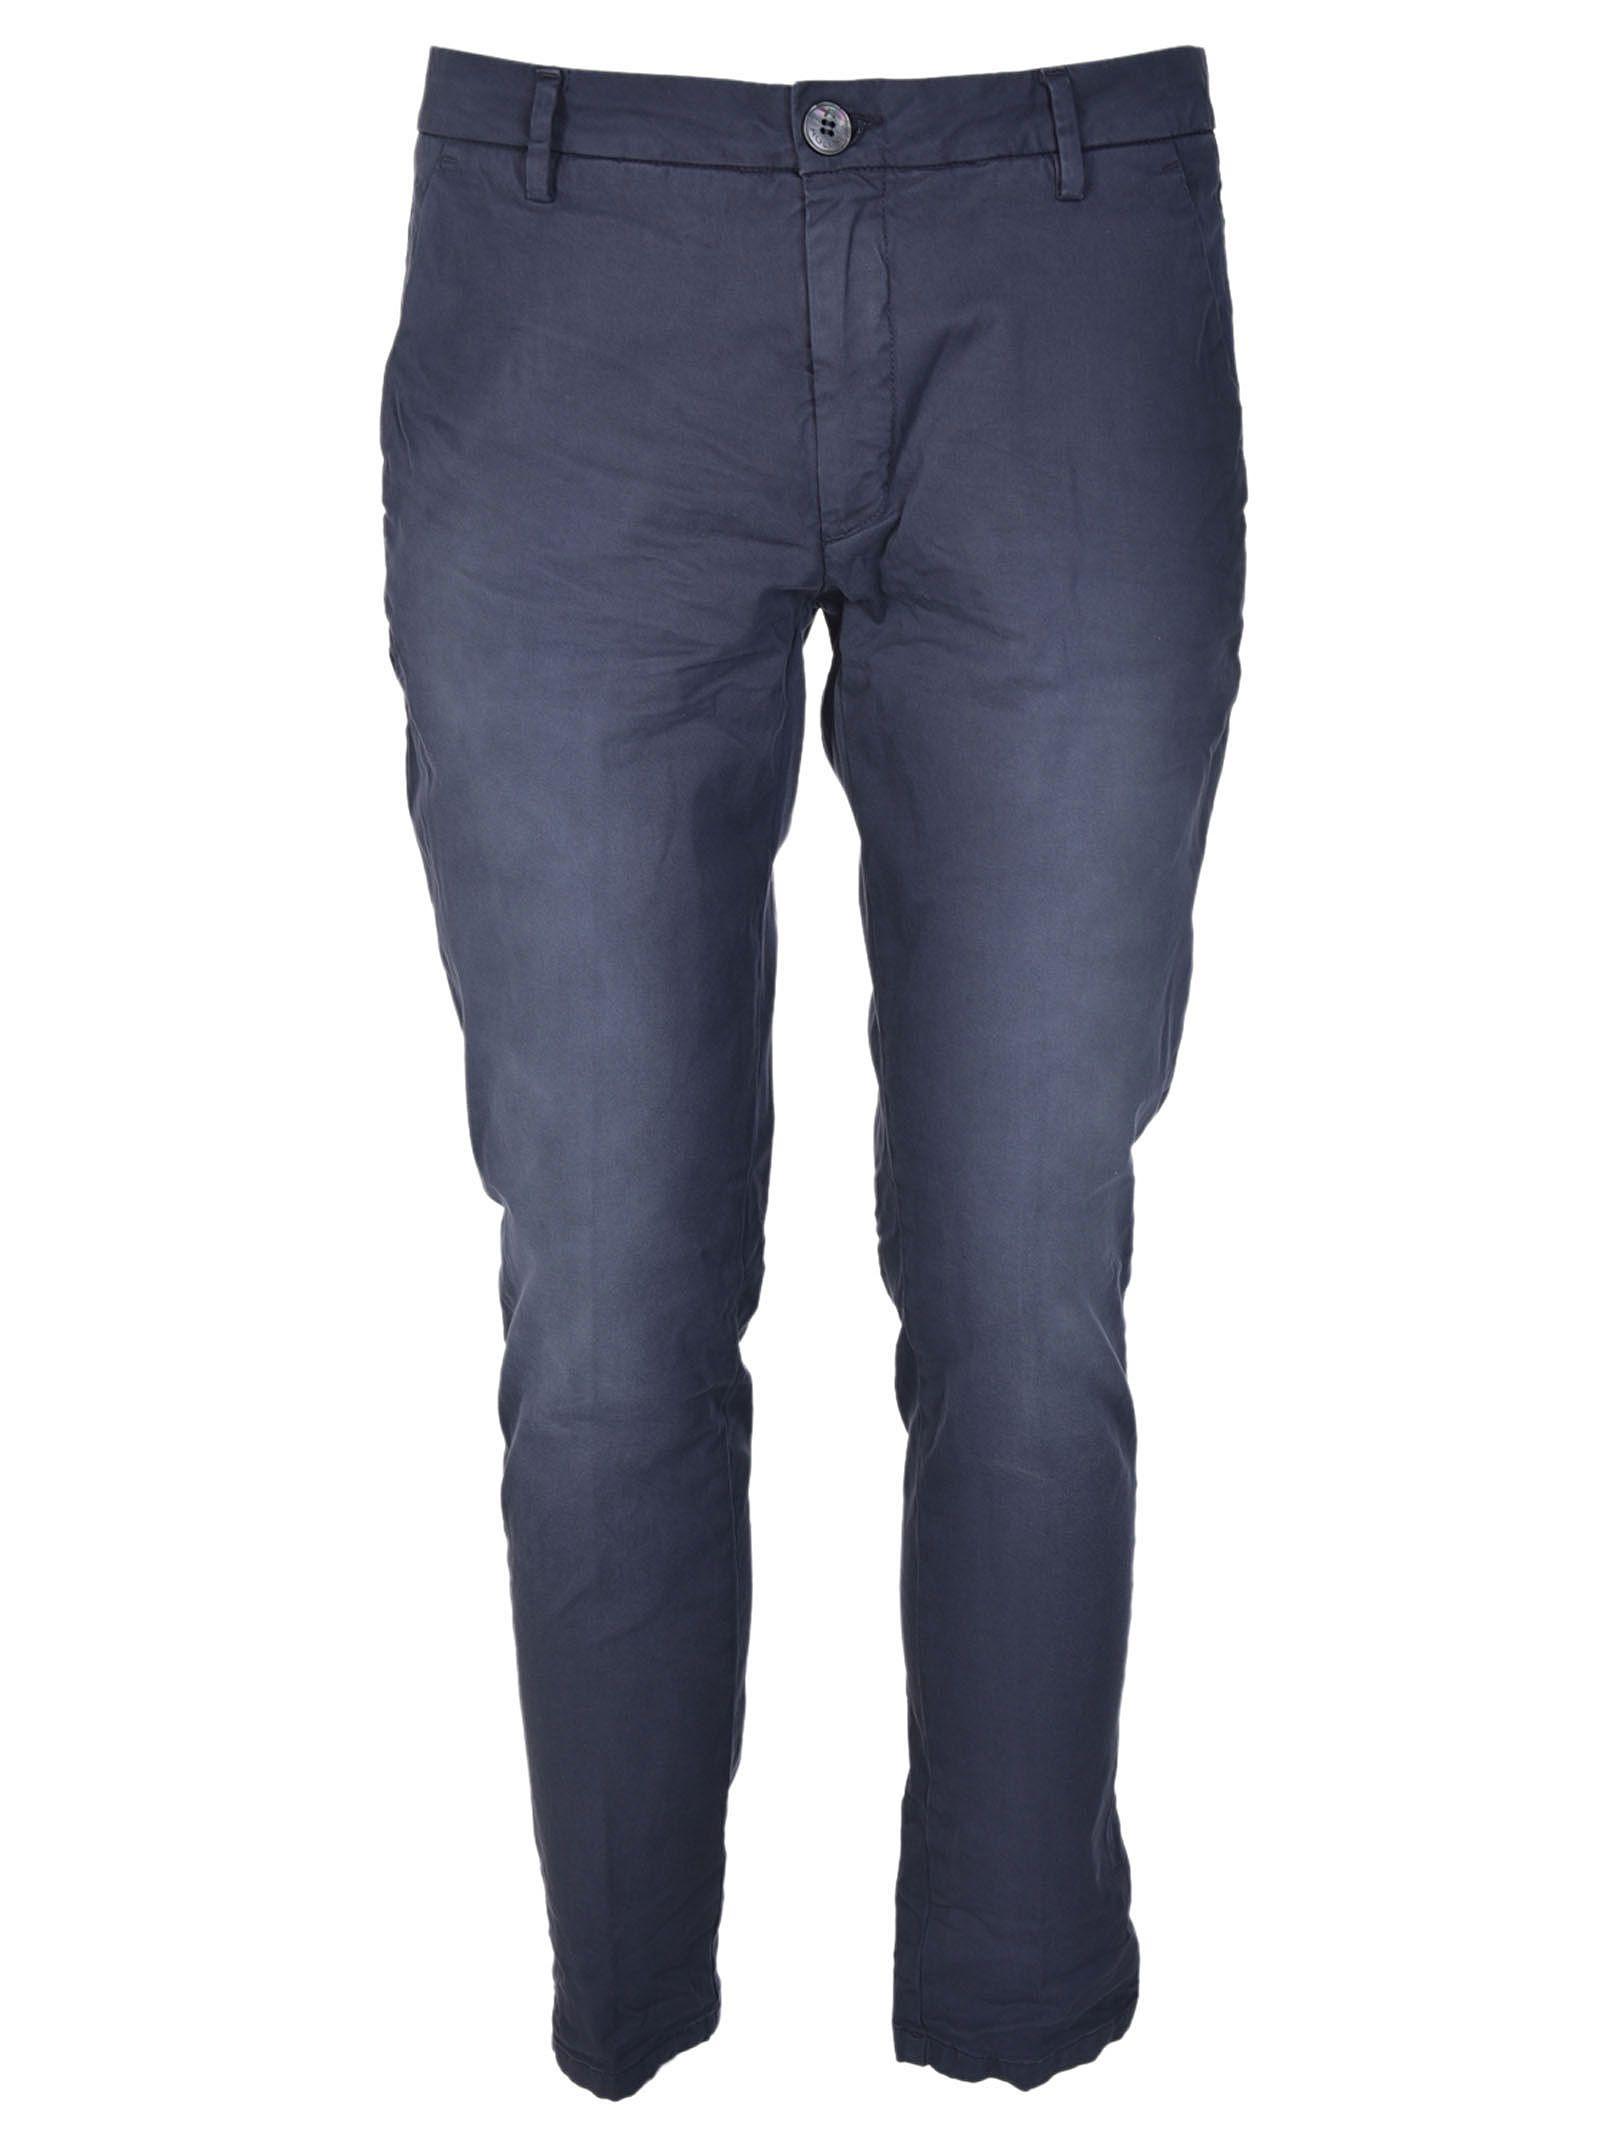 Aglini Slim Fit Trousers